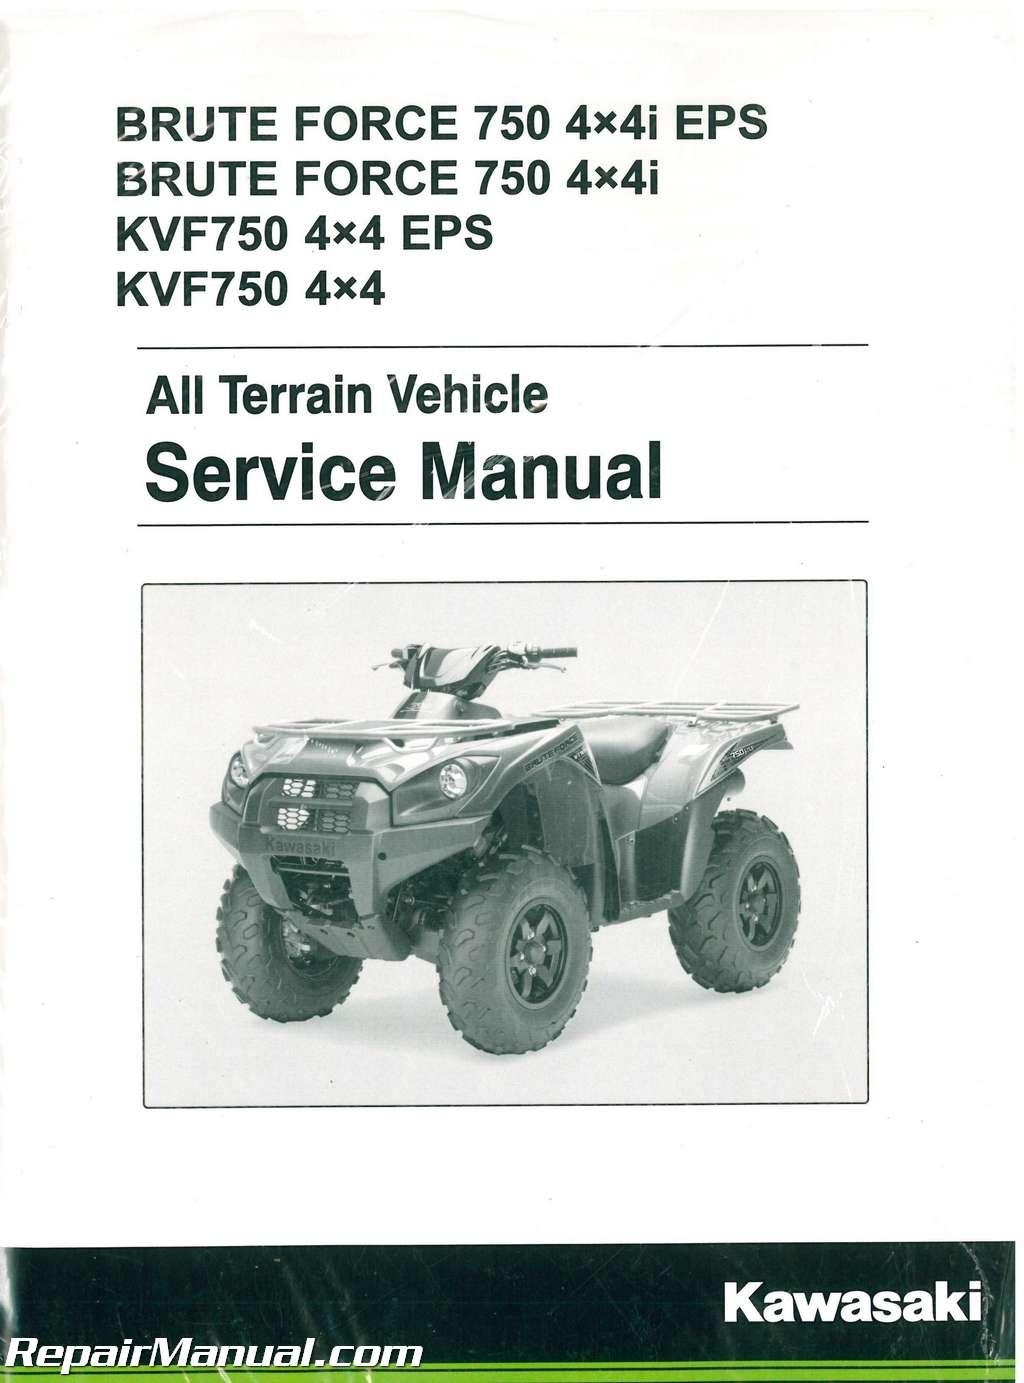 2012 2020 kawasaki brute force kvf750 4x4 4x4eps 4x4i 4x4i eps atv service manual